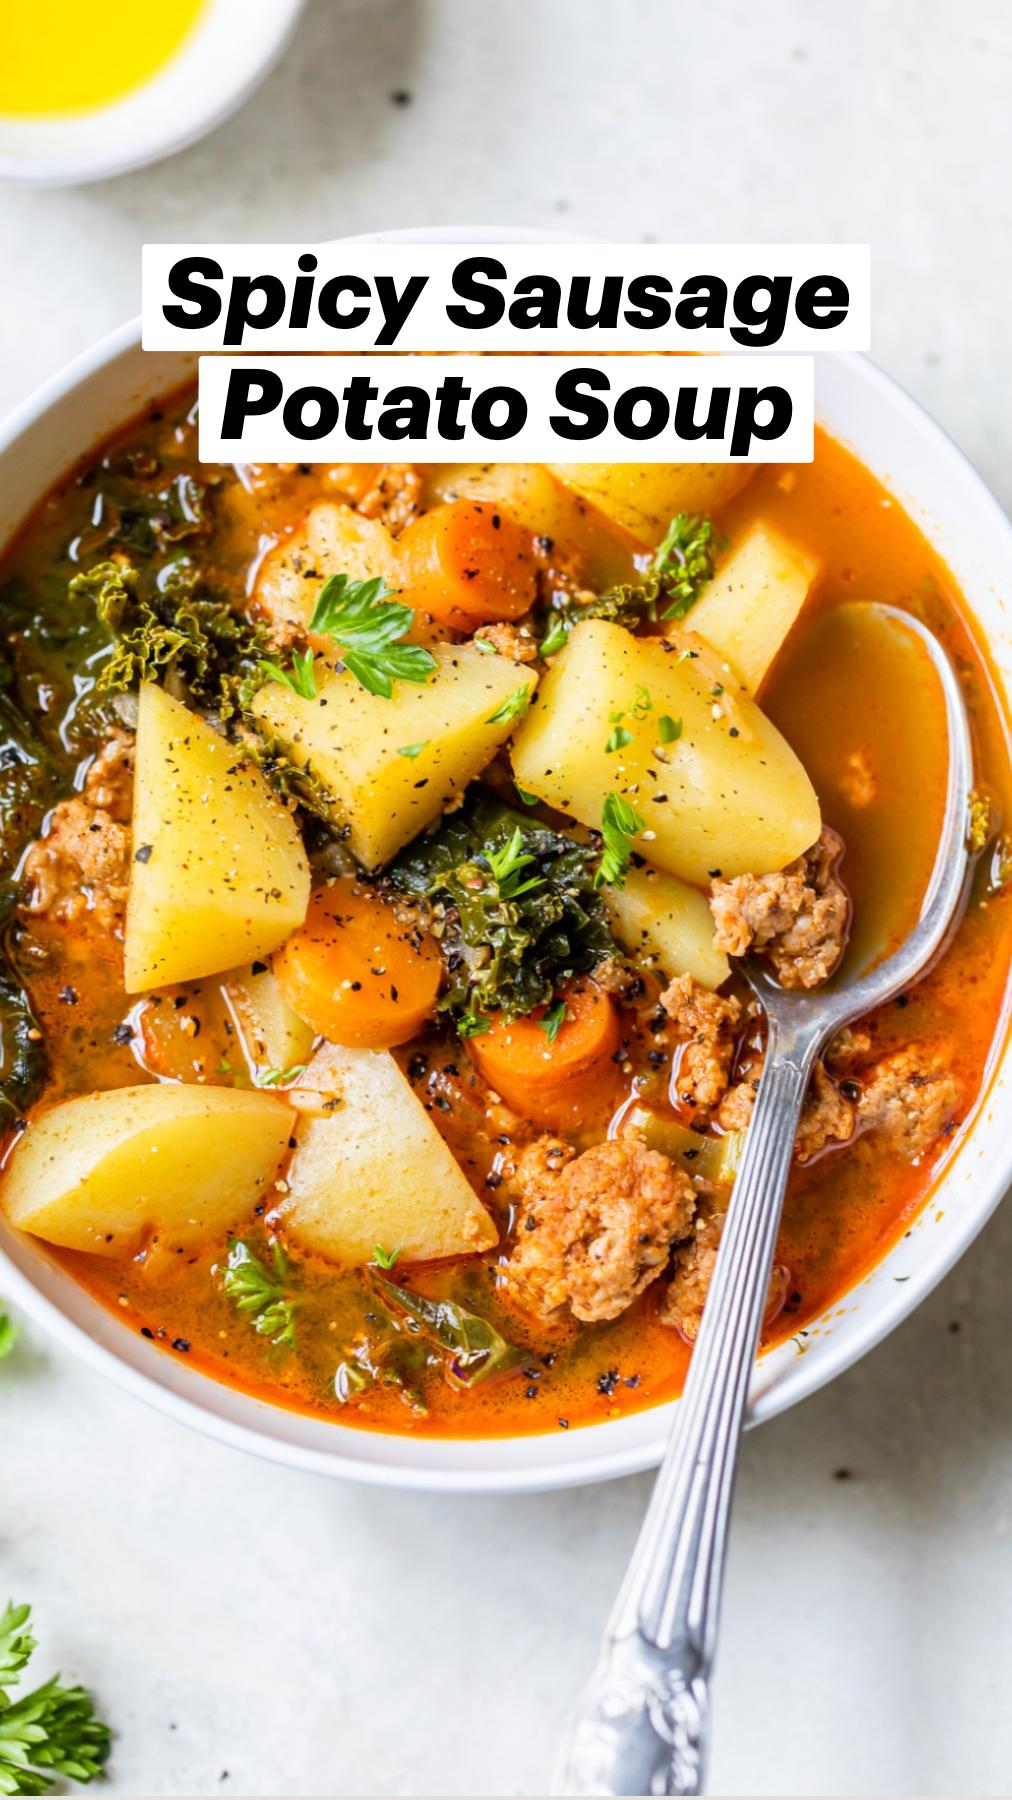 Spicy Sausage Potato Soup